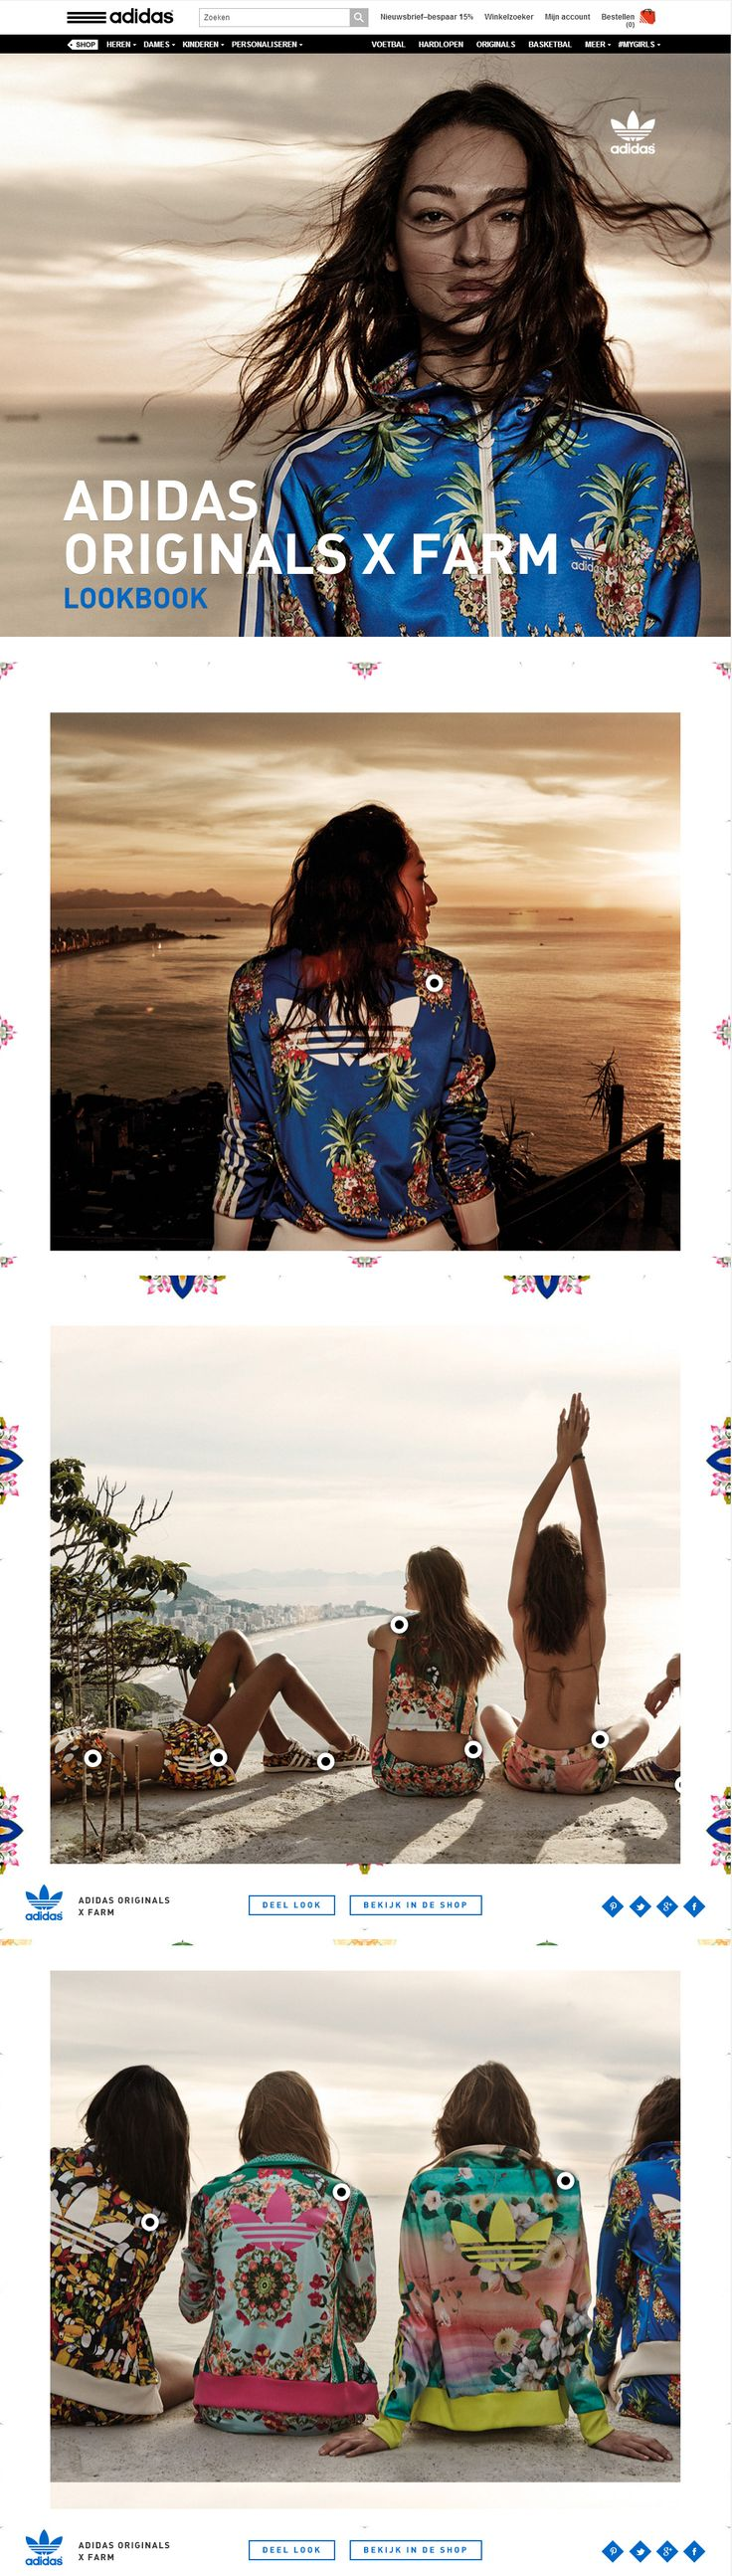 adidas Originals X Farm Lookbook, May 25, 2014.  http://www.awwwards.com/web-design-awards/adidas-originals-x-farm-lookbook #UI #Inspiration #Scroll #OnePage #Colorful #WebDesign #SOTD #Awwwards